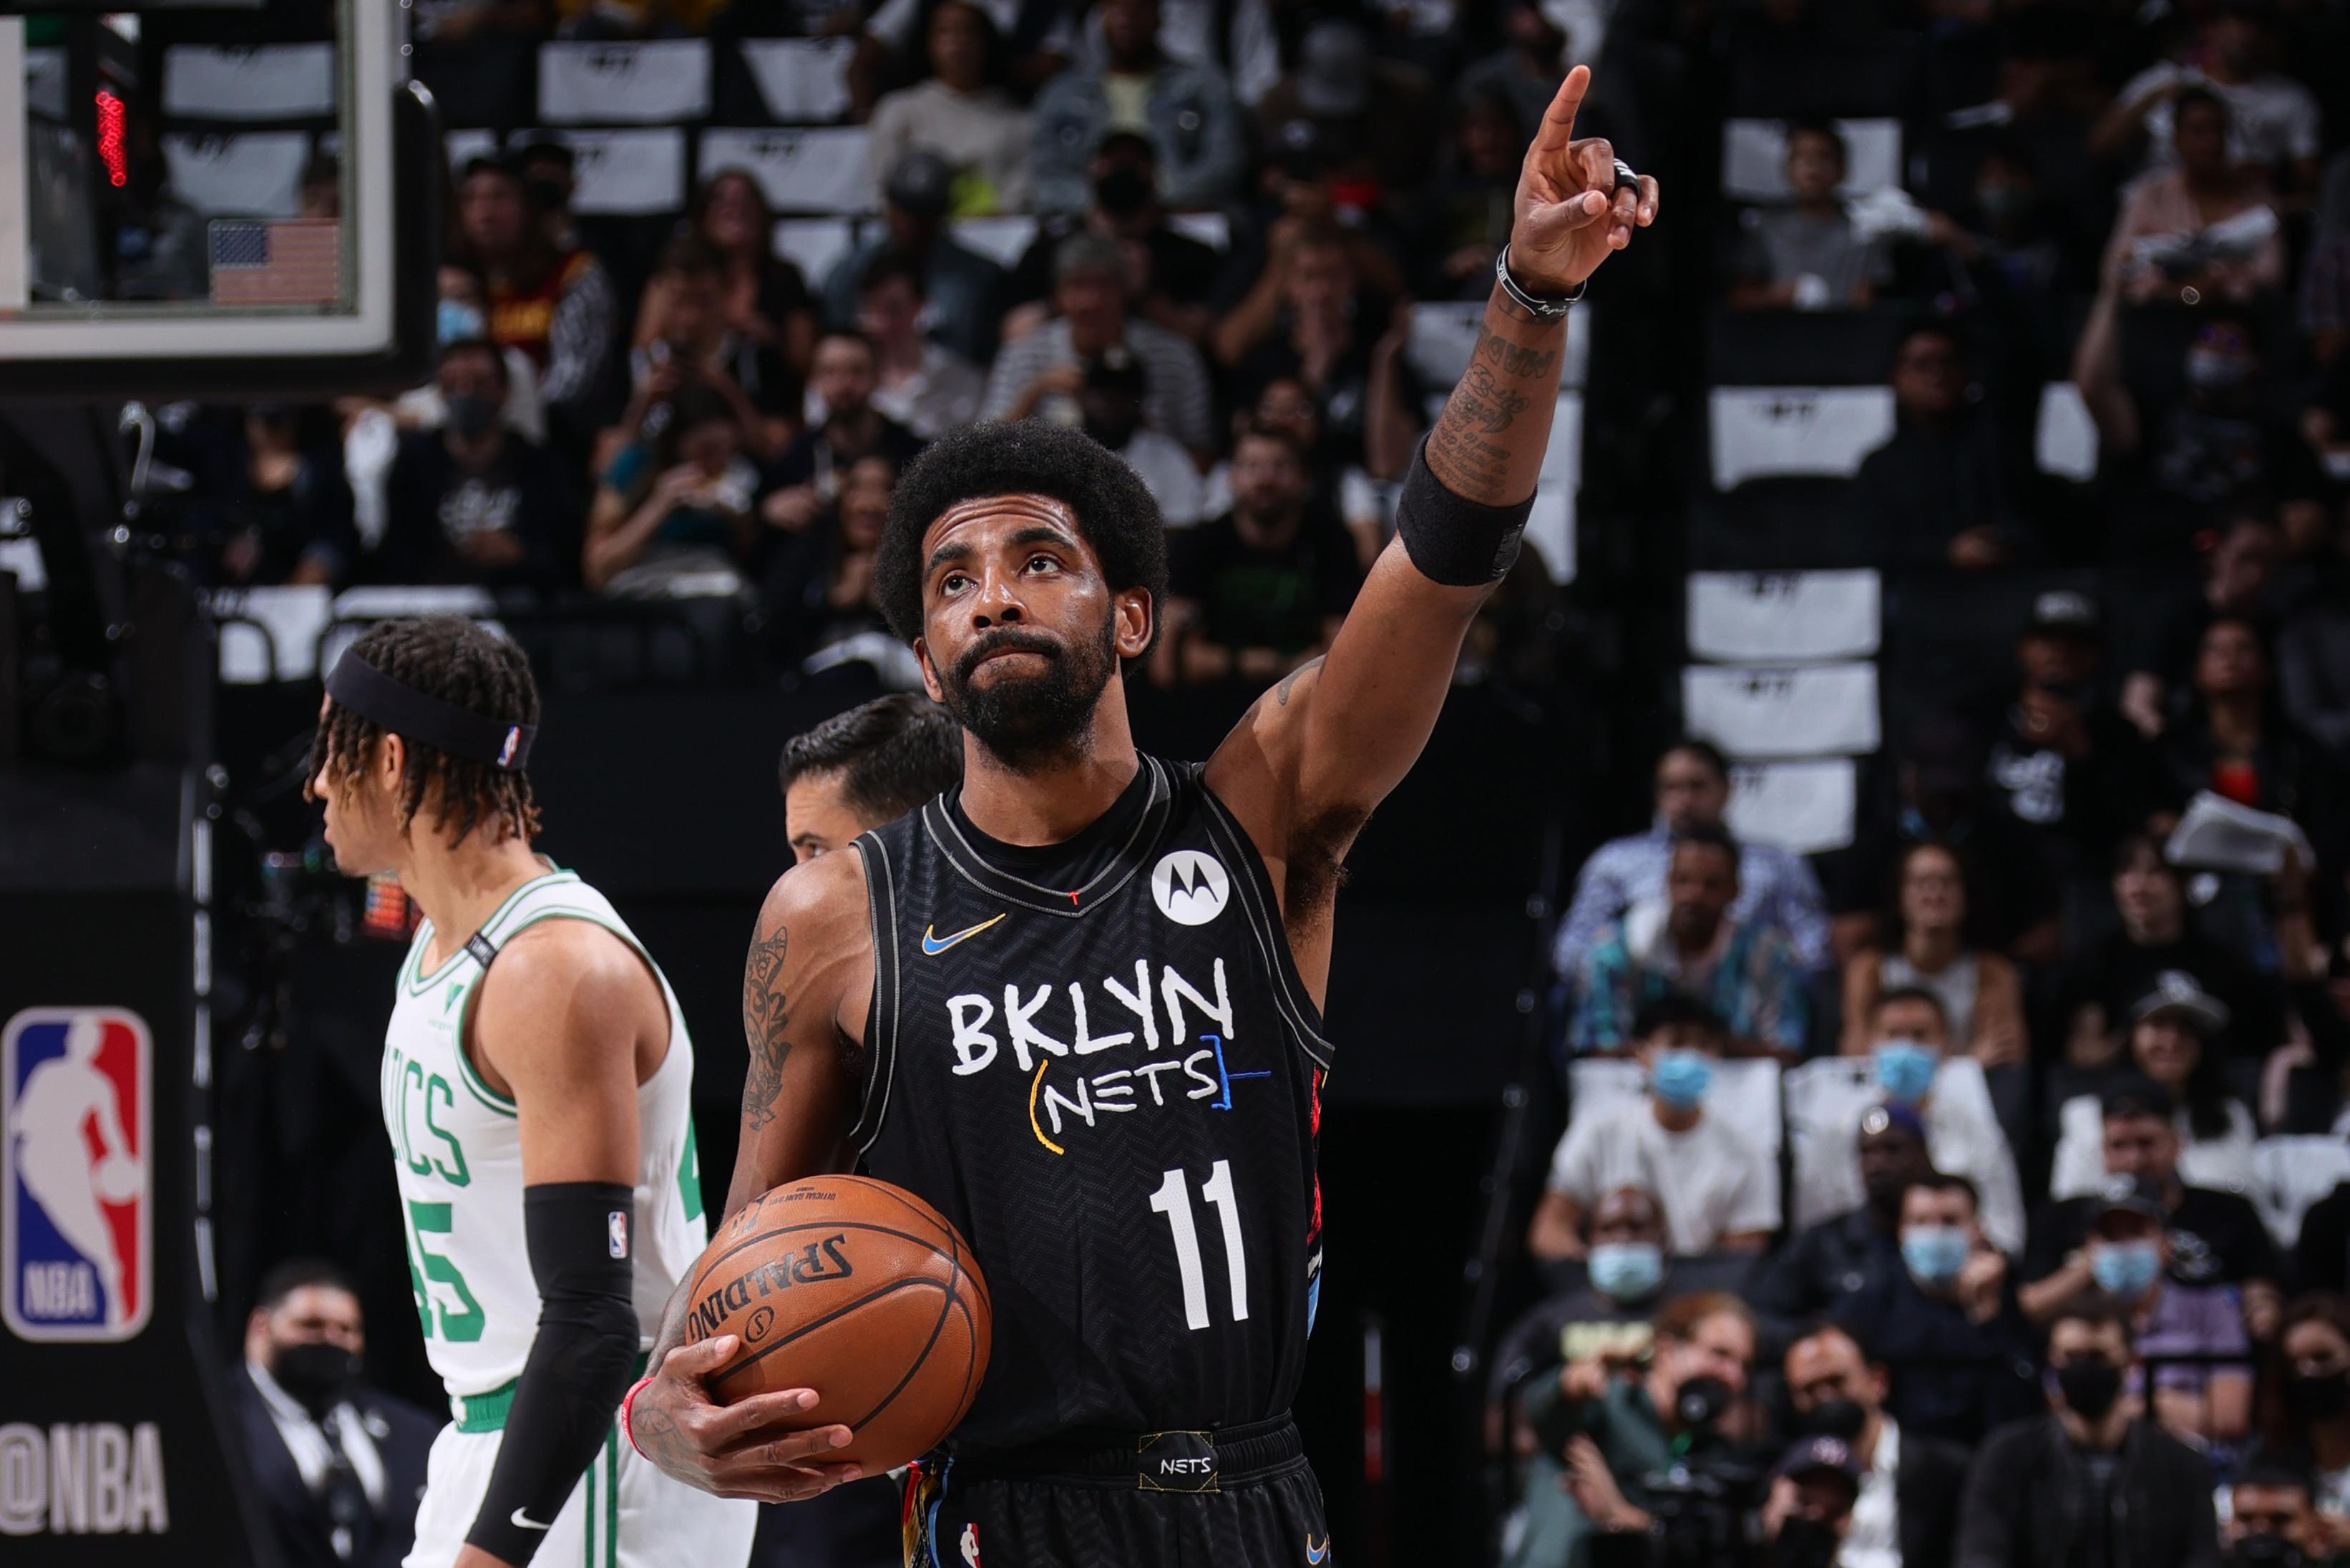 Kyrie Irving on Nets Closing Series vs. Celtics: 'I'm Glad It's Settled' thumbnail